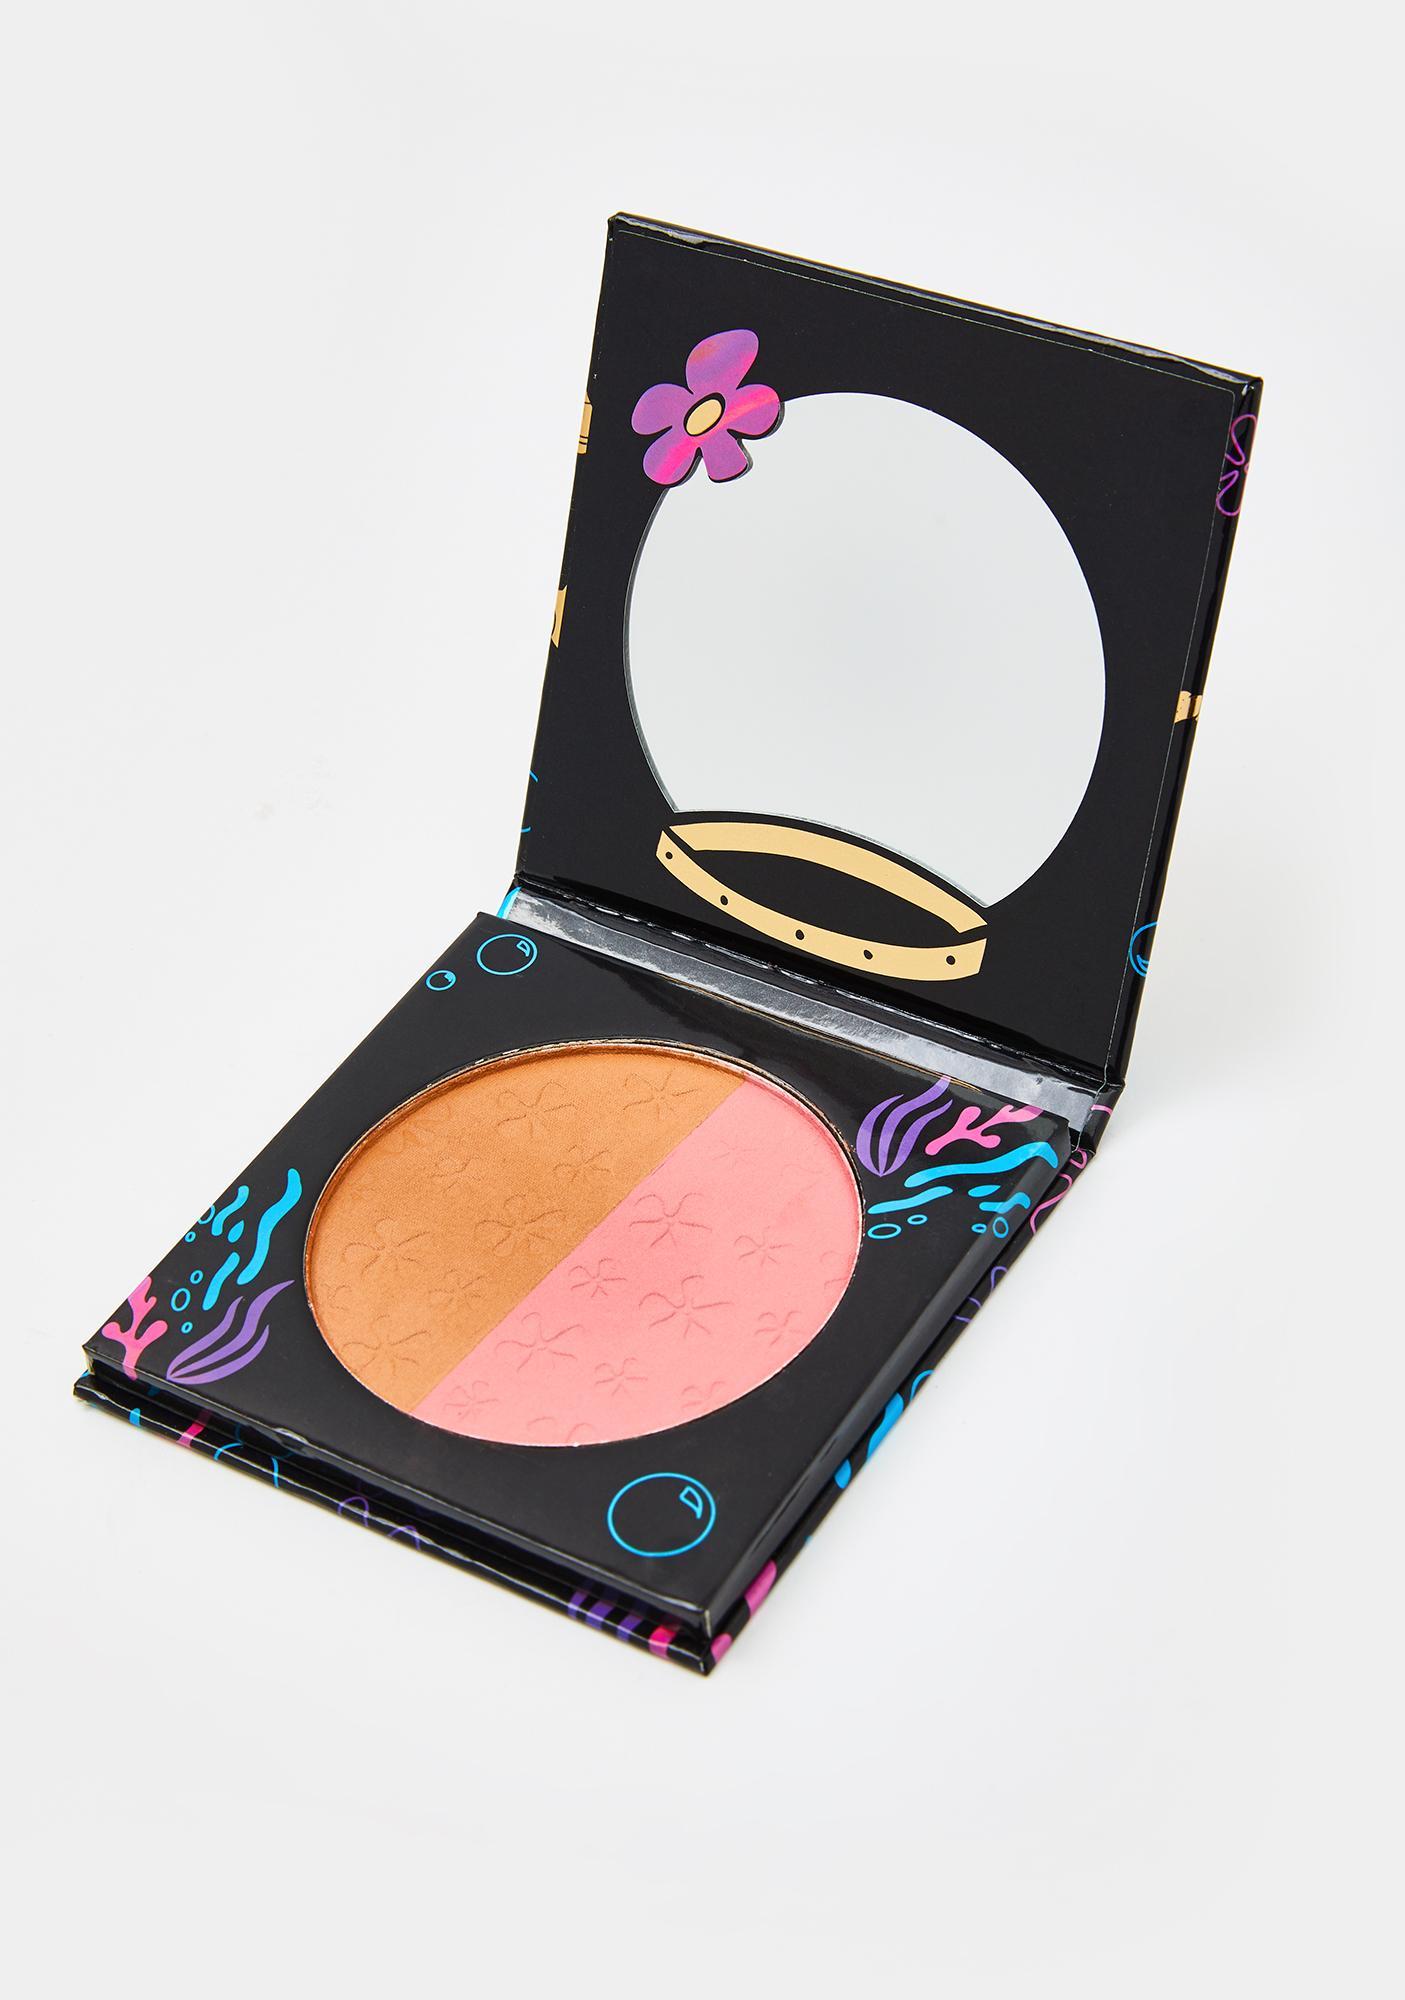 HipDot Sandy Cheeks Blush N Bronzer Compact